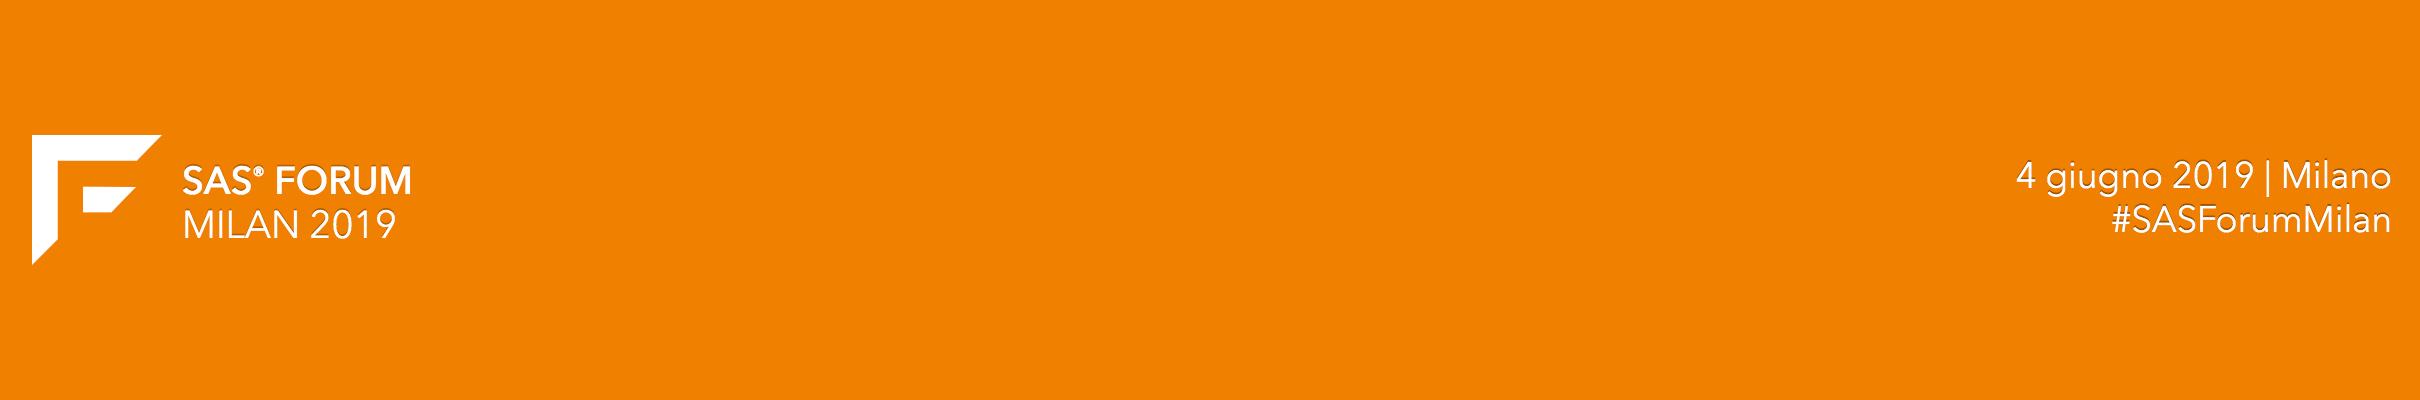 Banner-SAS.jpg 0